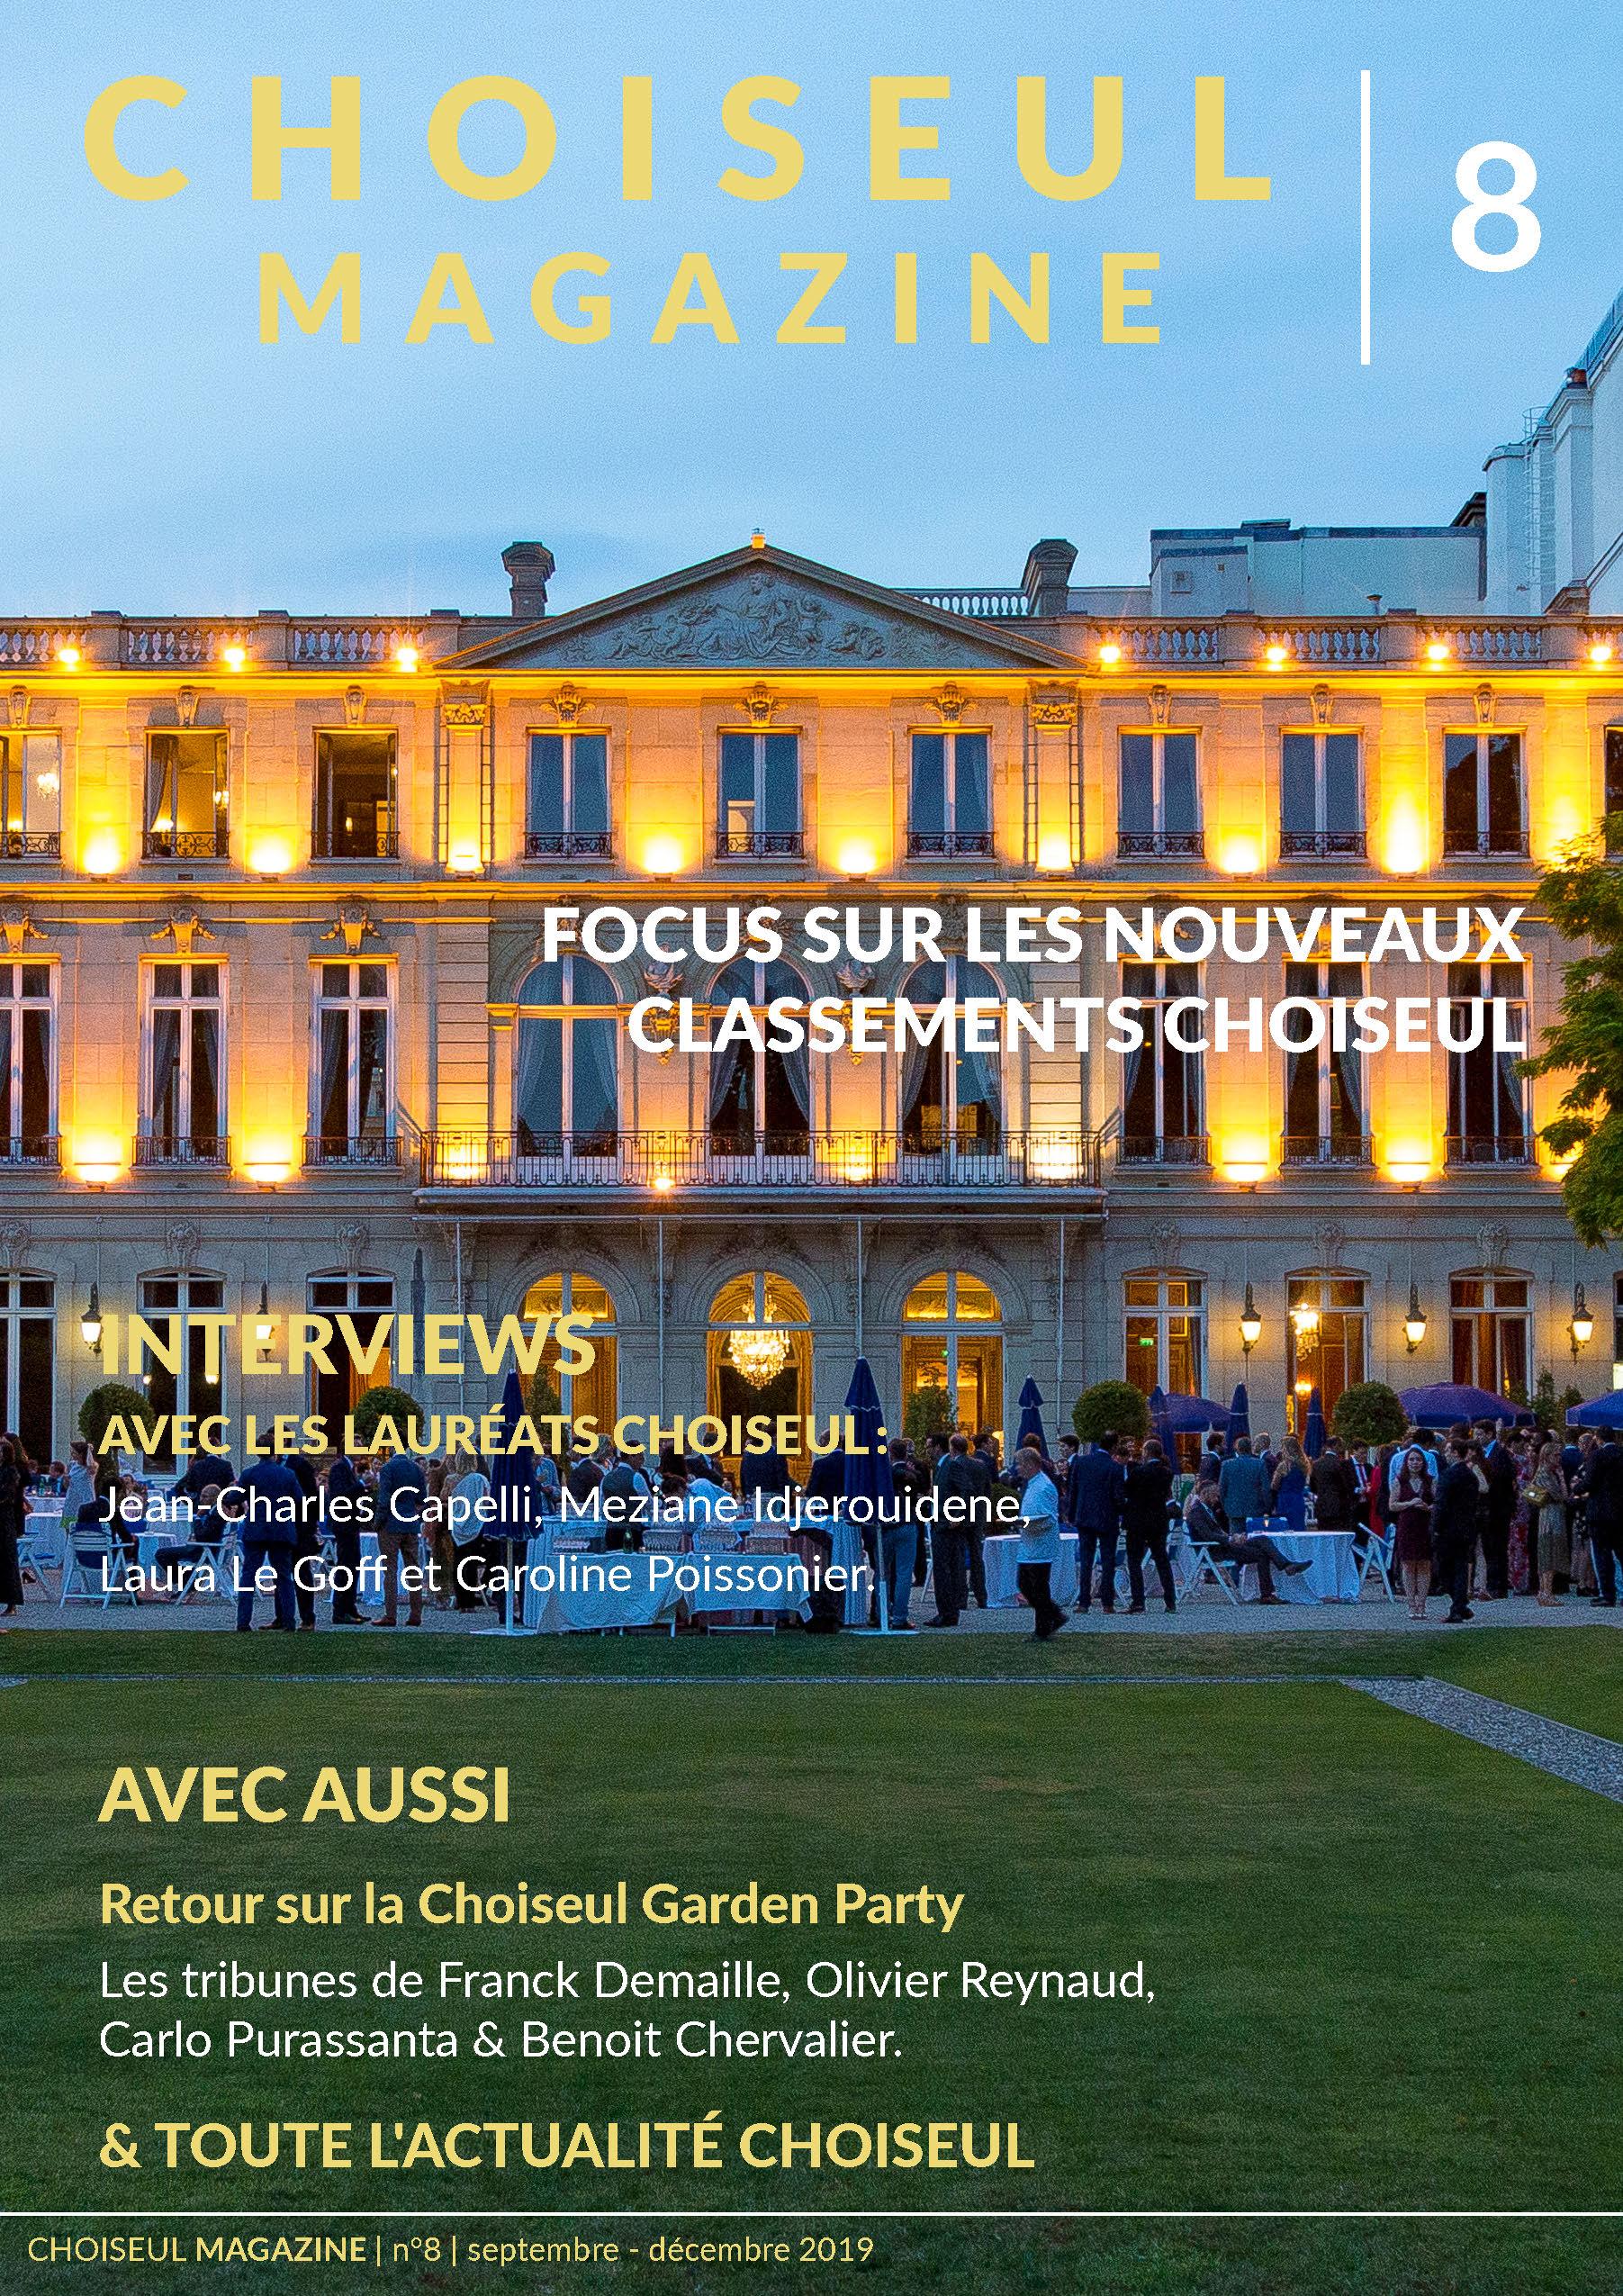 Choiseul Magazine n°8